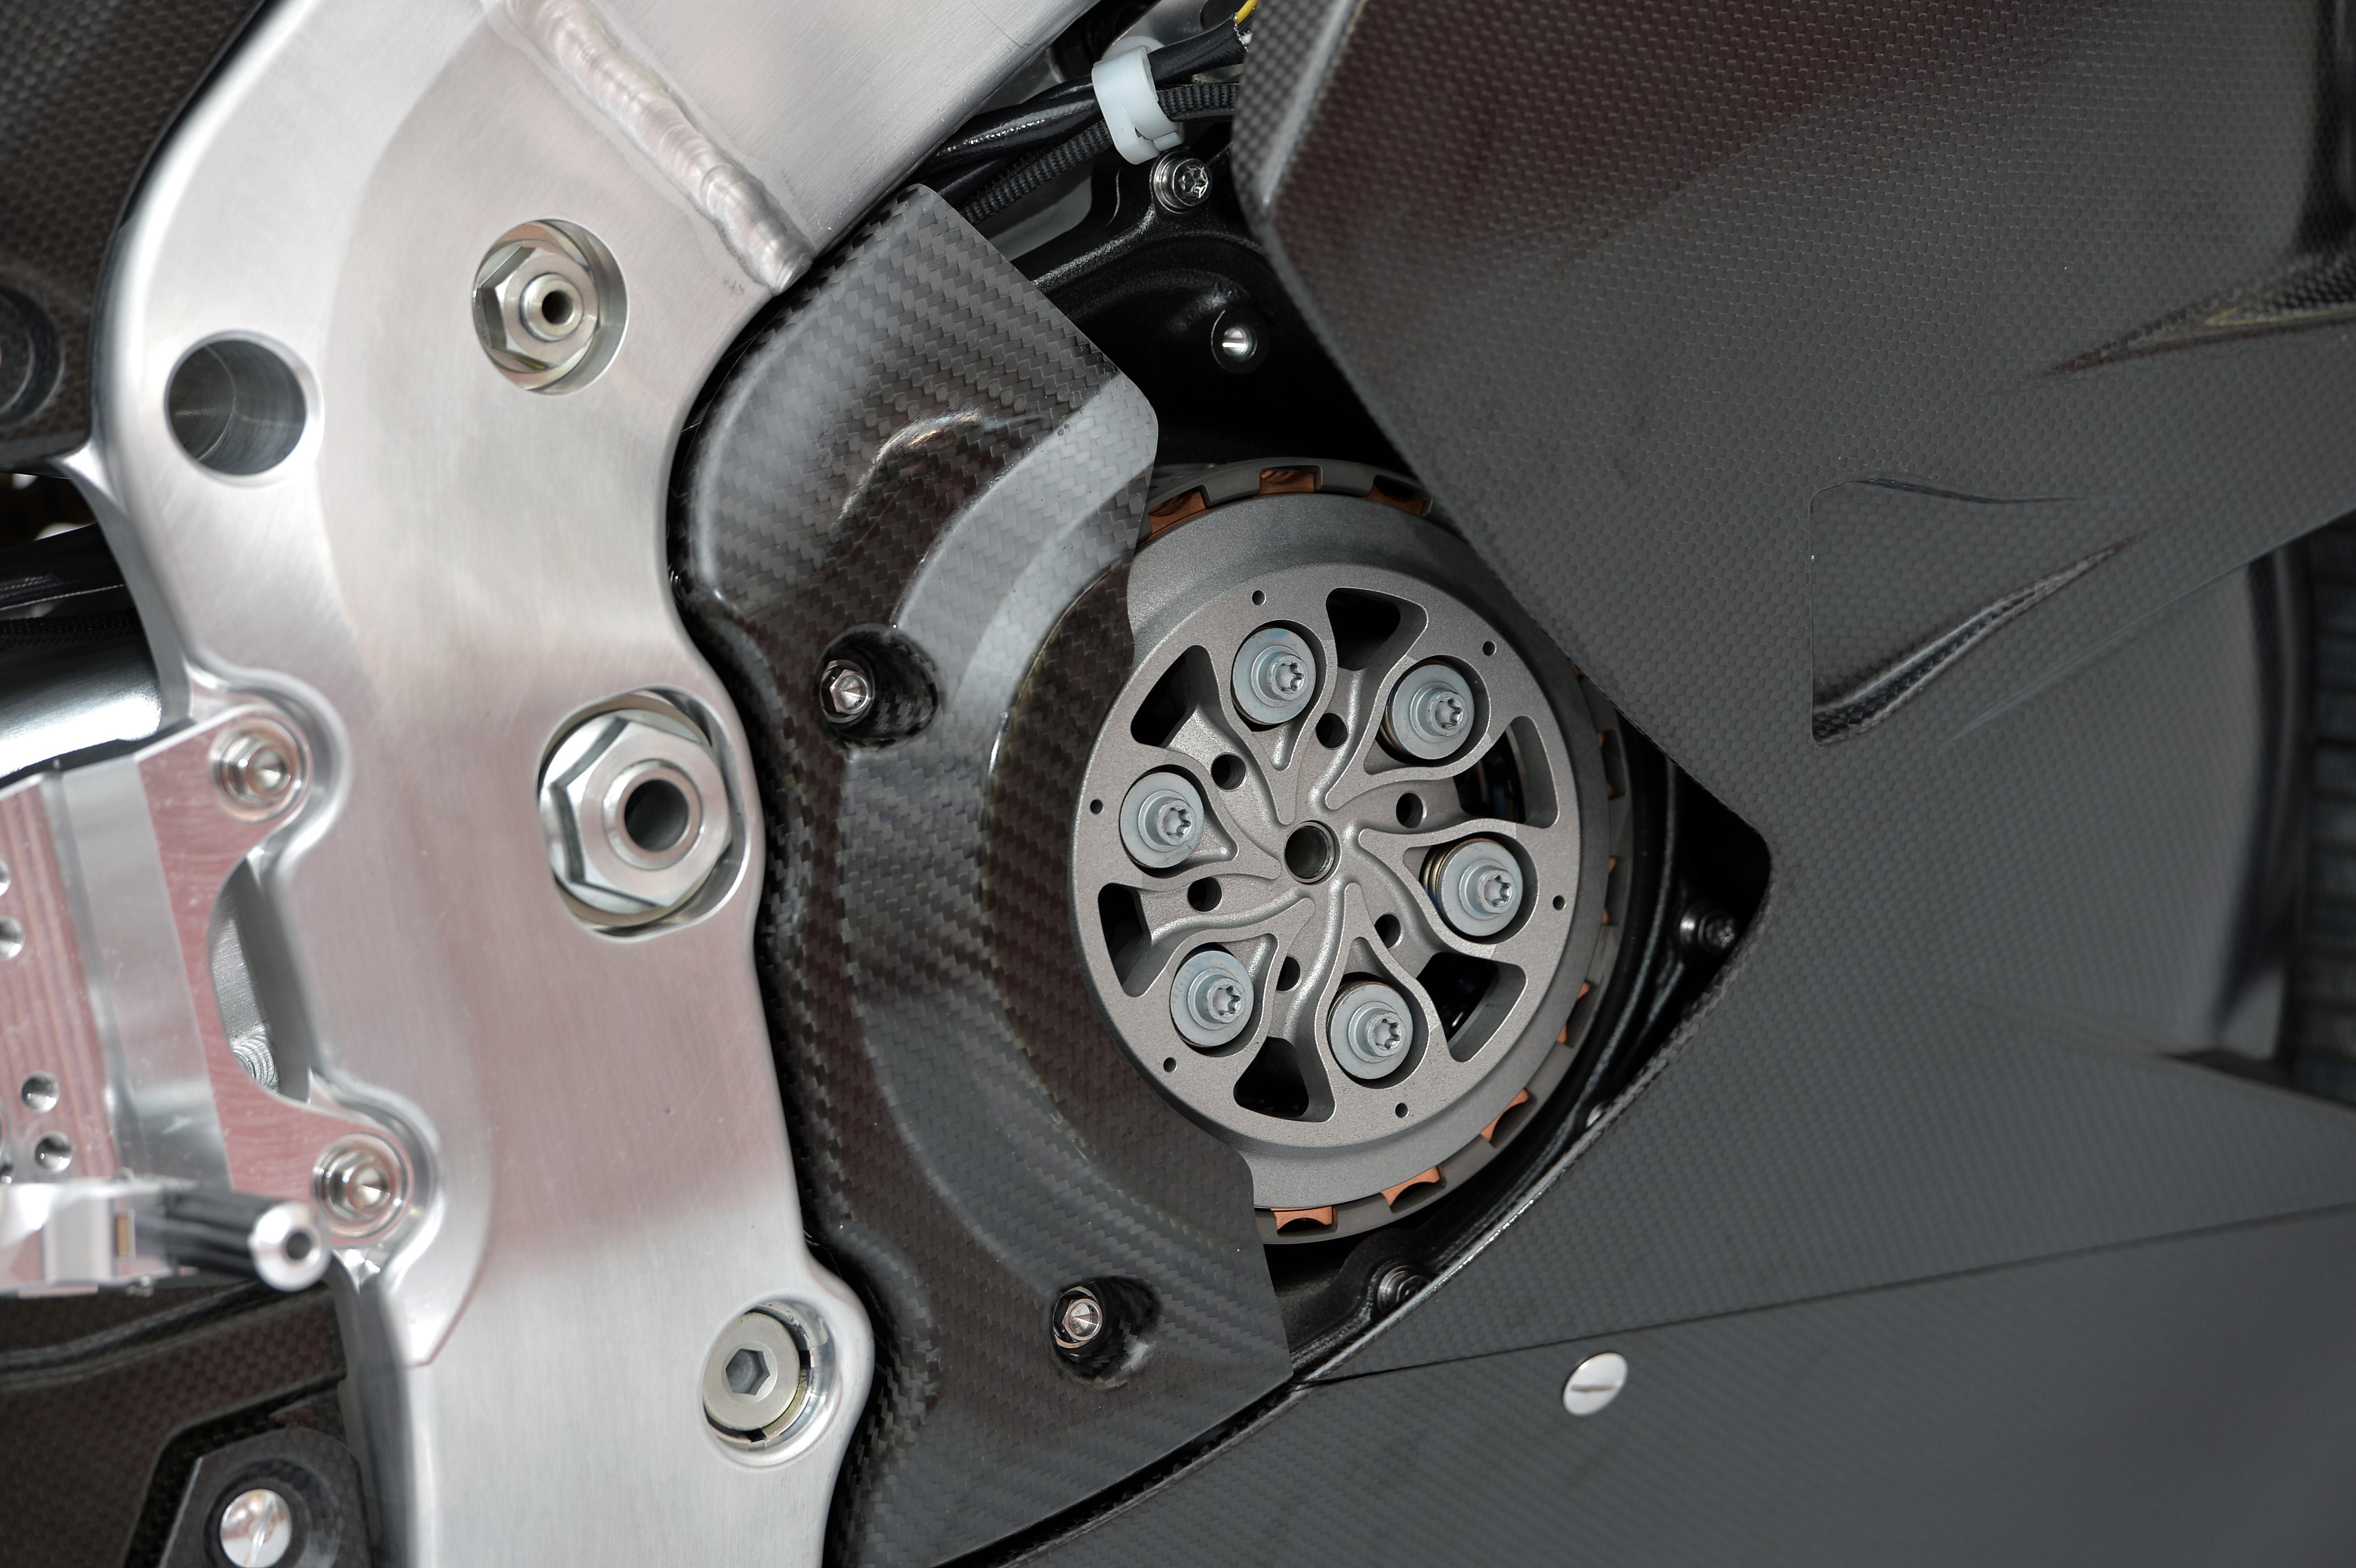 honda_rcv1000r_motogp_production_racer_www_racemoto_com_019